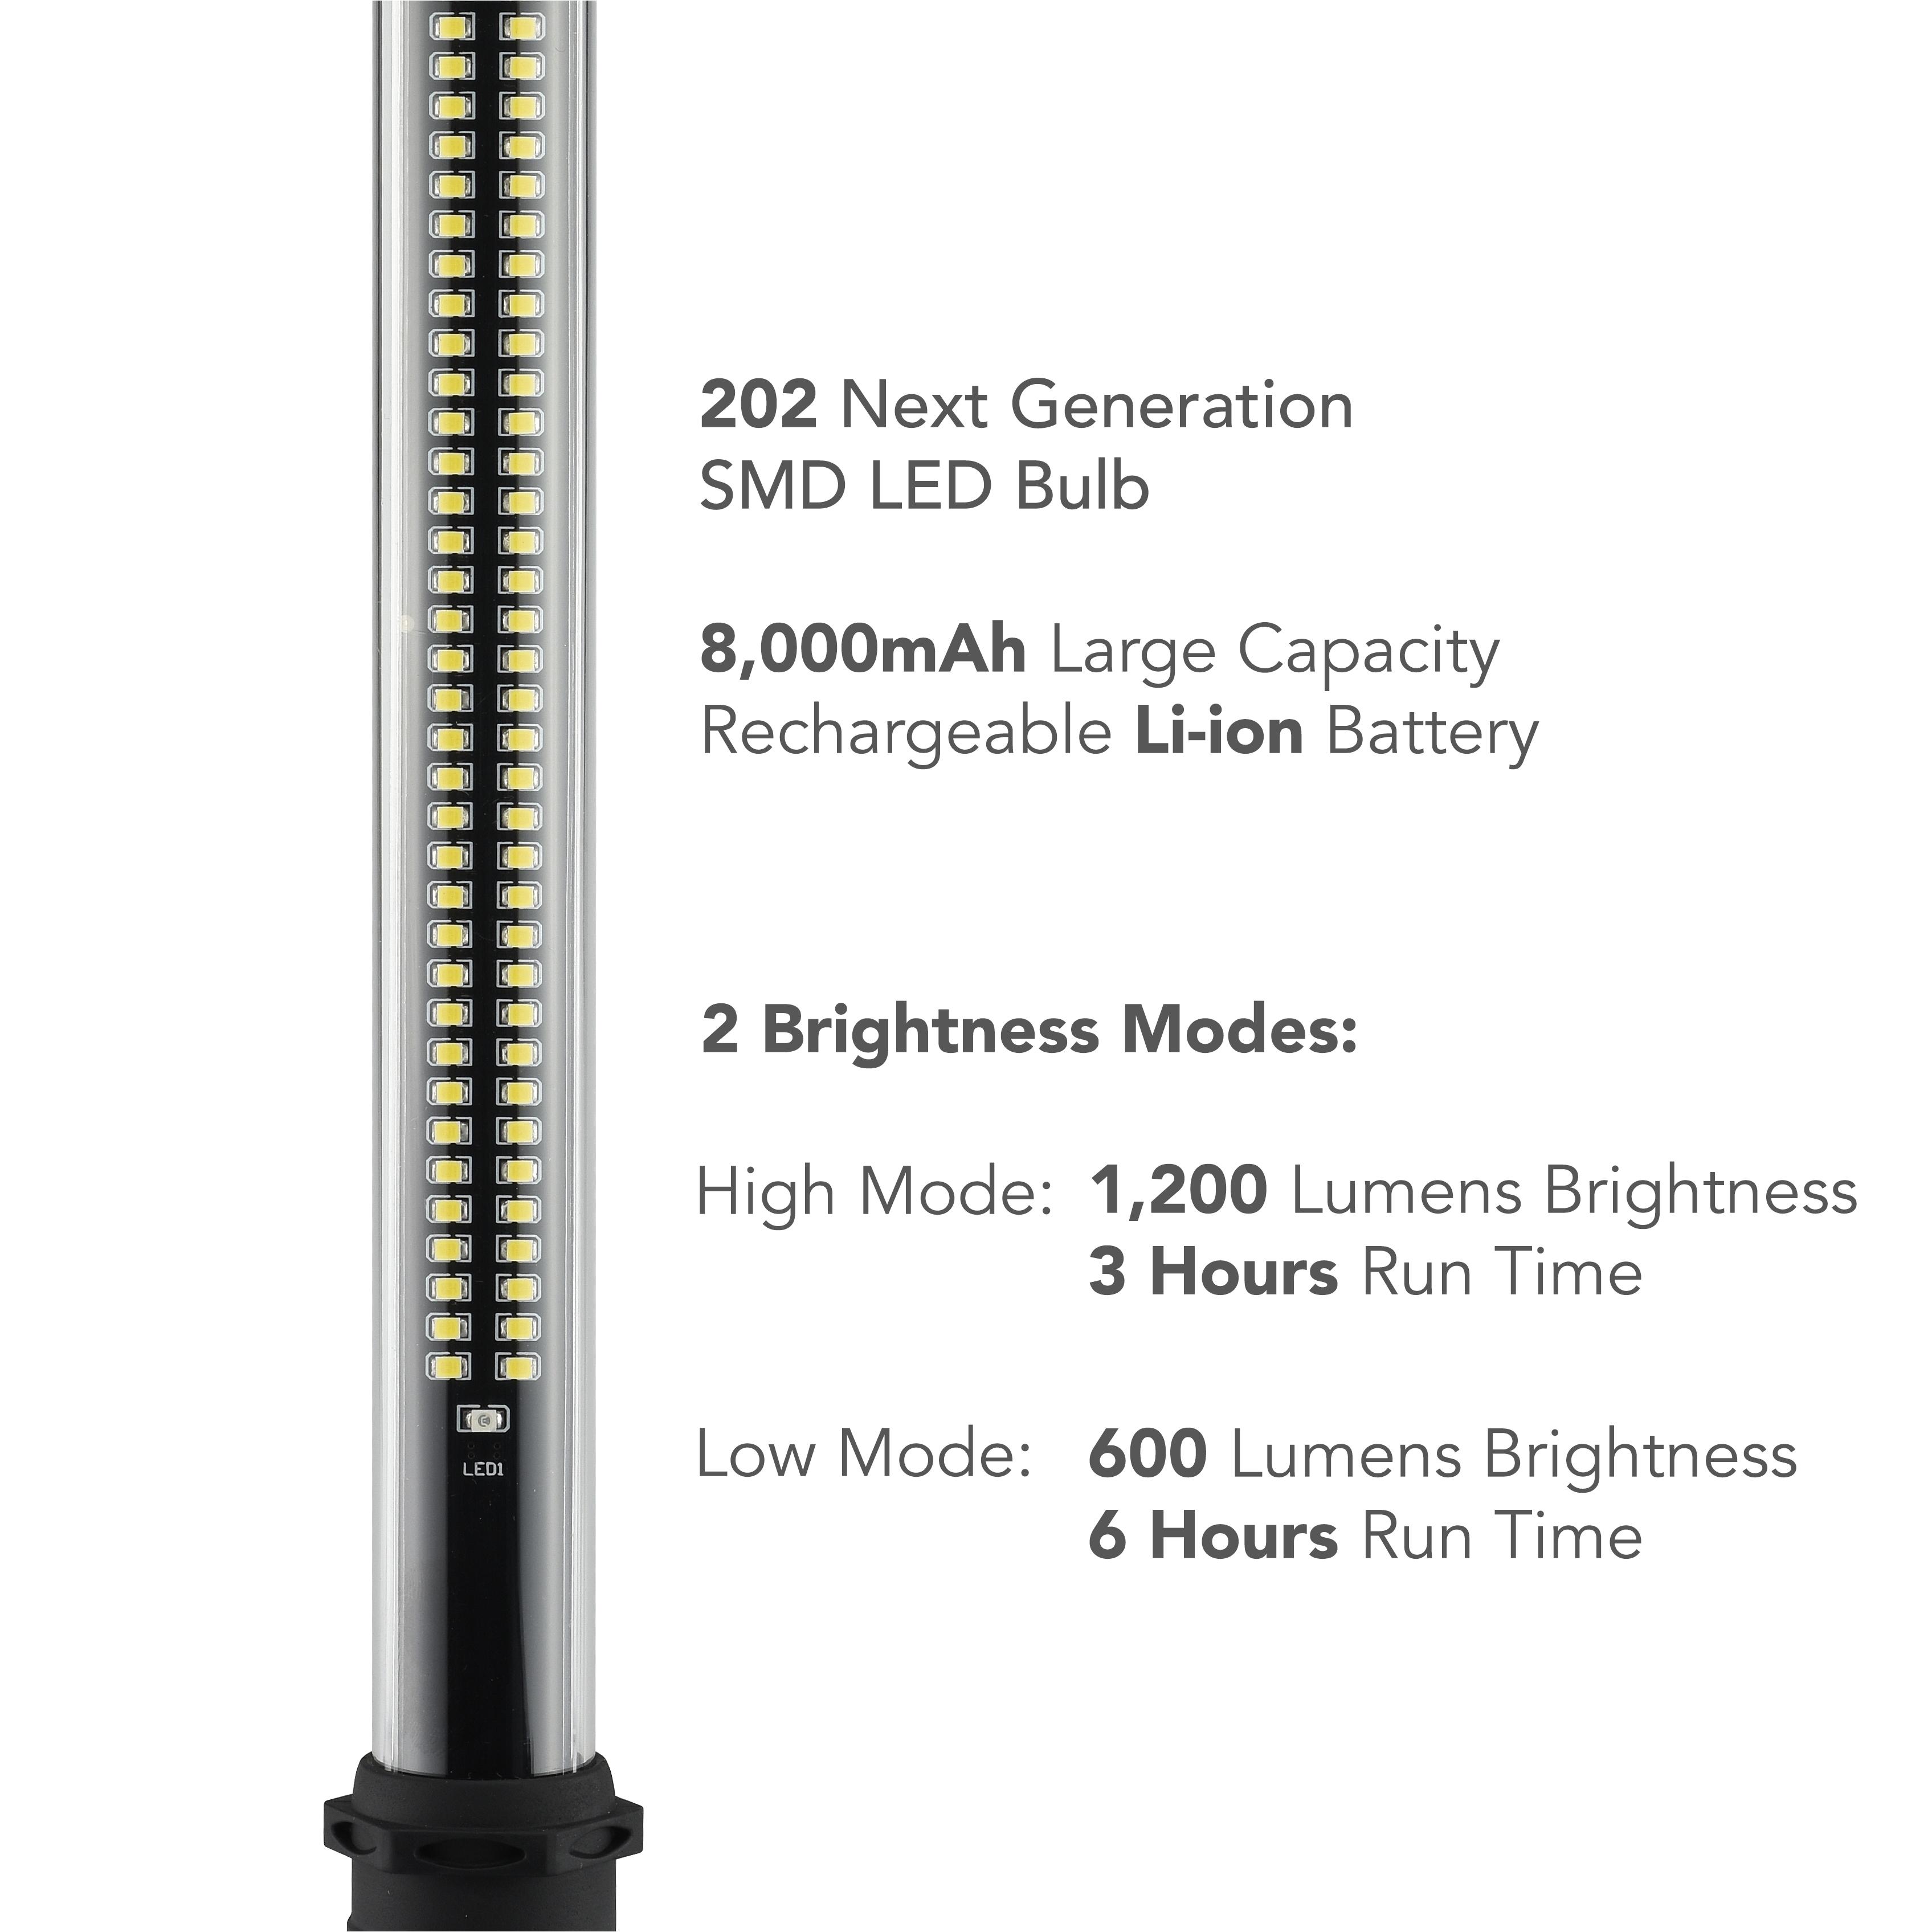 neiko 40447a rechargeable underhood work light 202 smd led bulbs 1200 lumens max brightness 8000 mah li ion battery 2 brightness modes